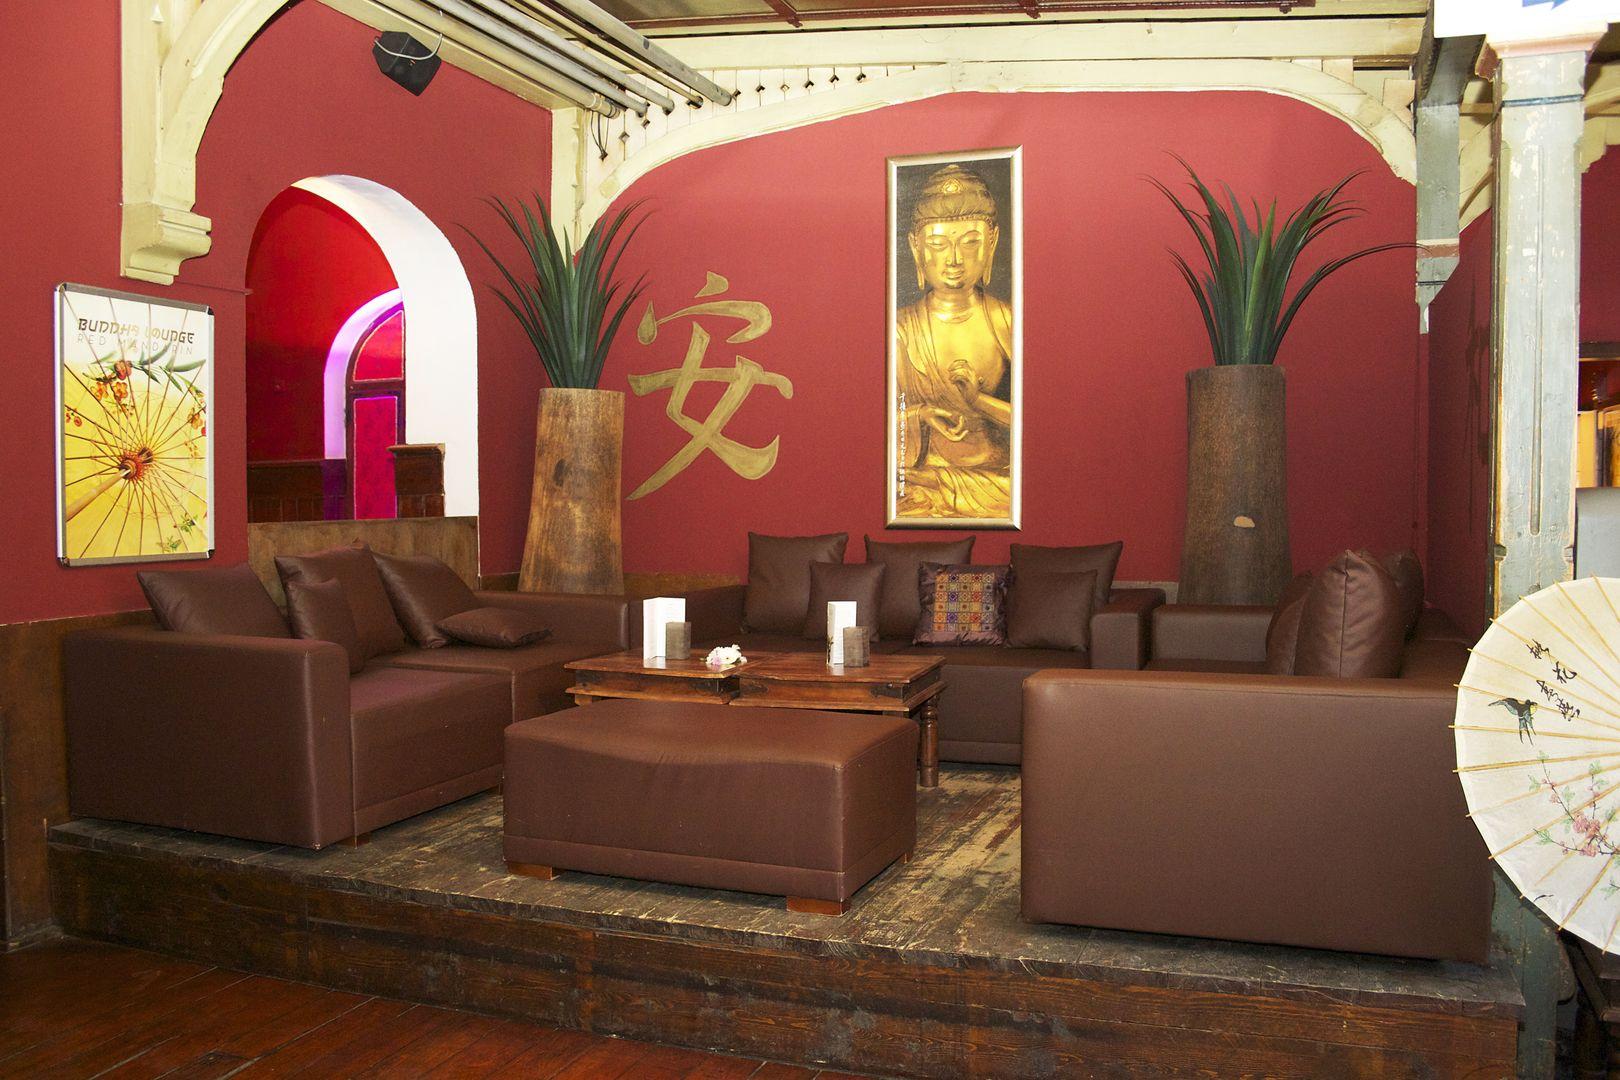 buddha lounge wuppertal pornostar münchen